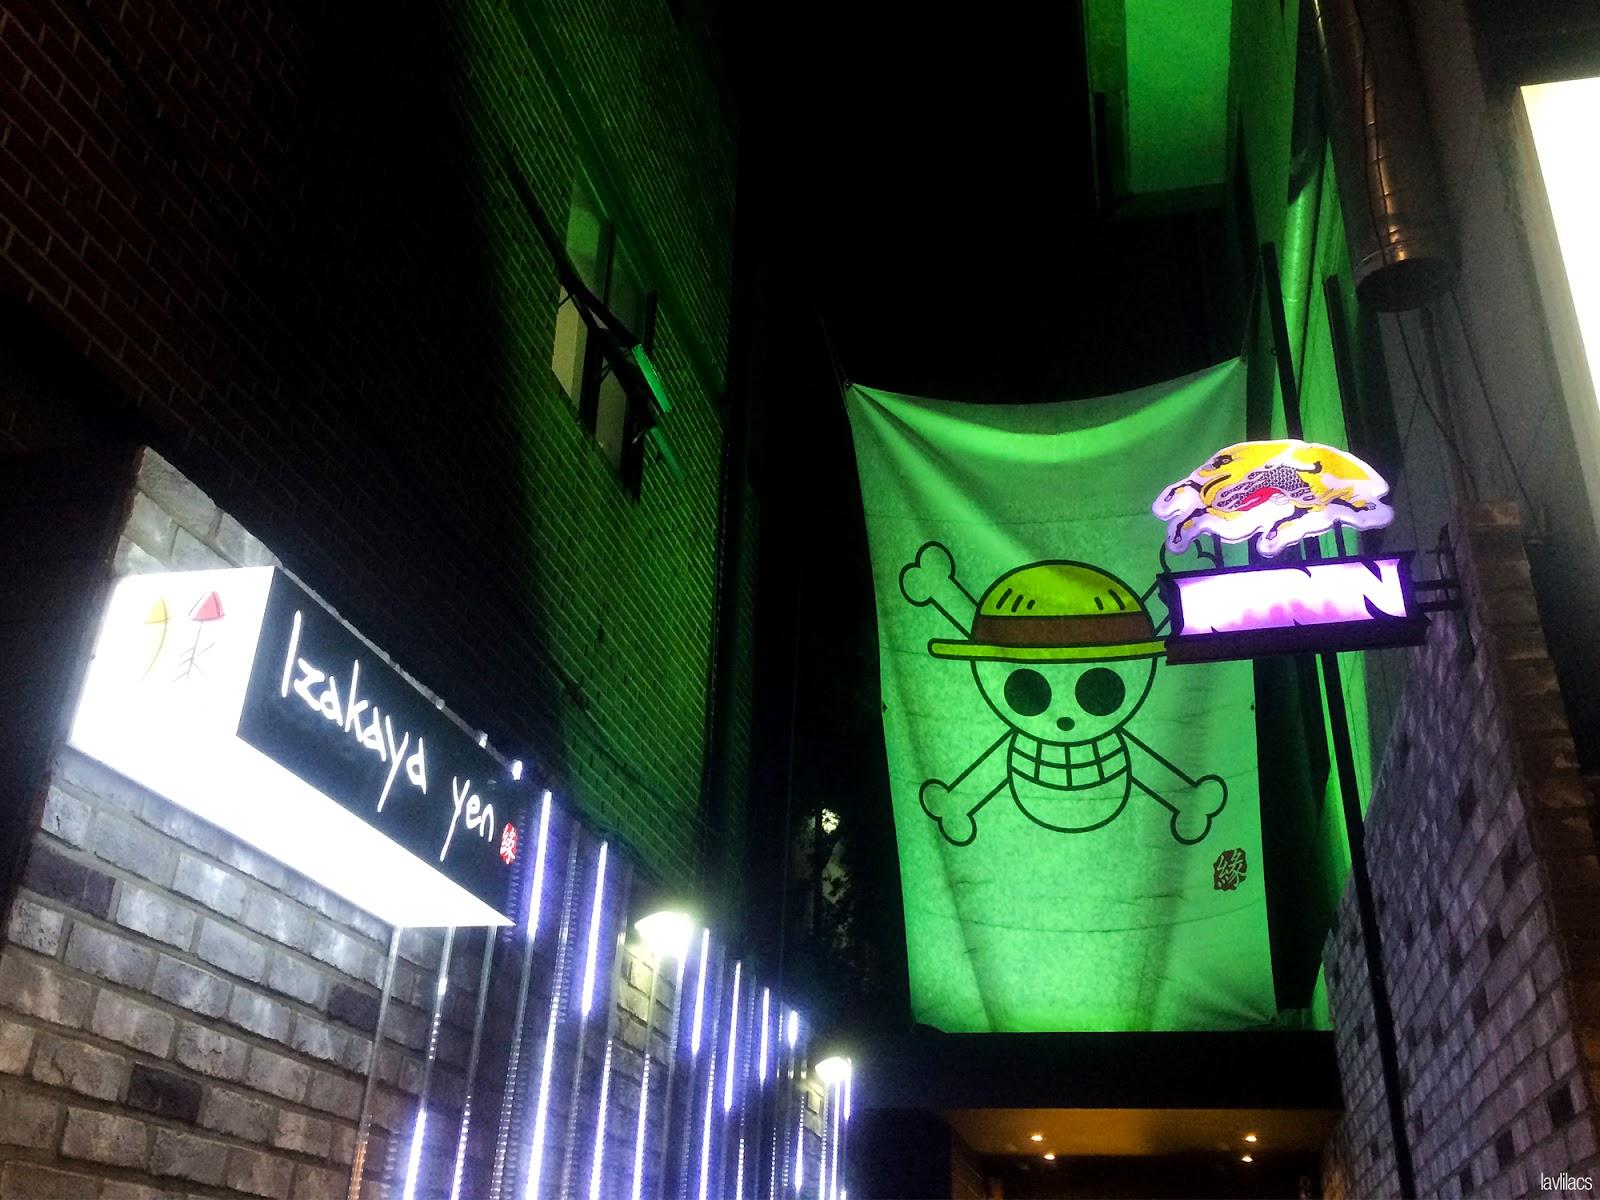 Seoul, Korea - Summer Study Abroad 2014 - Hongdae One Piece Restaurant Bar